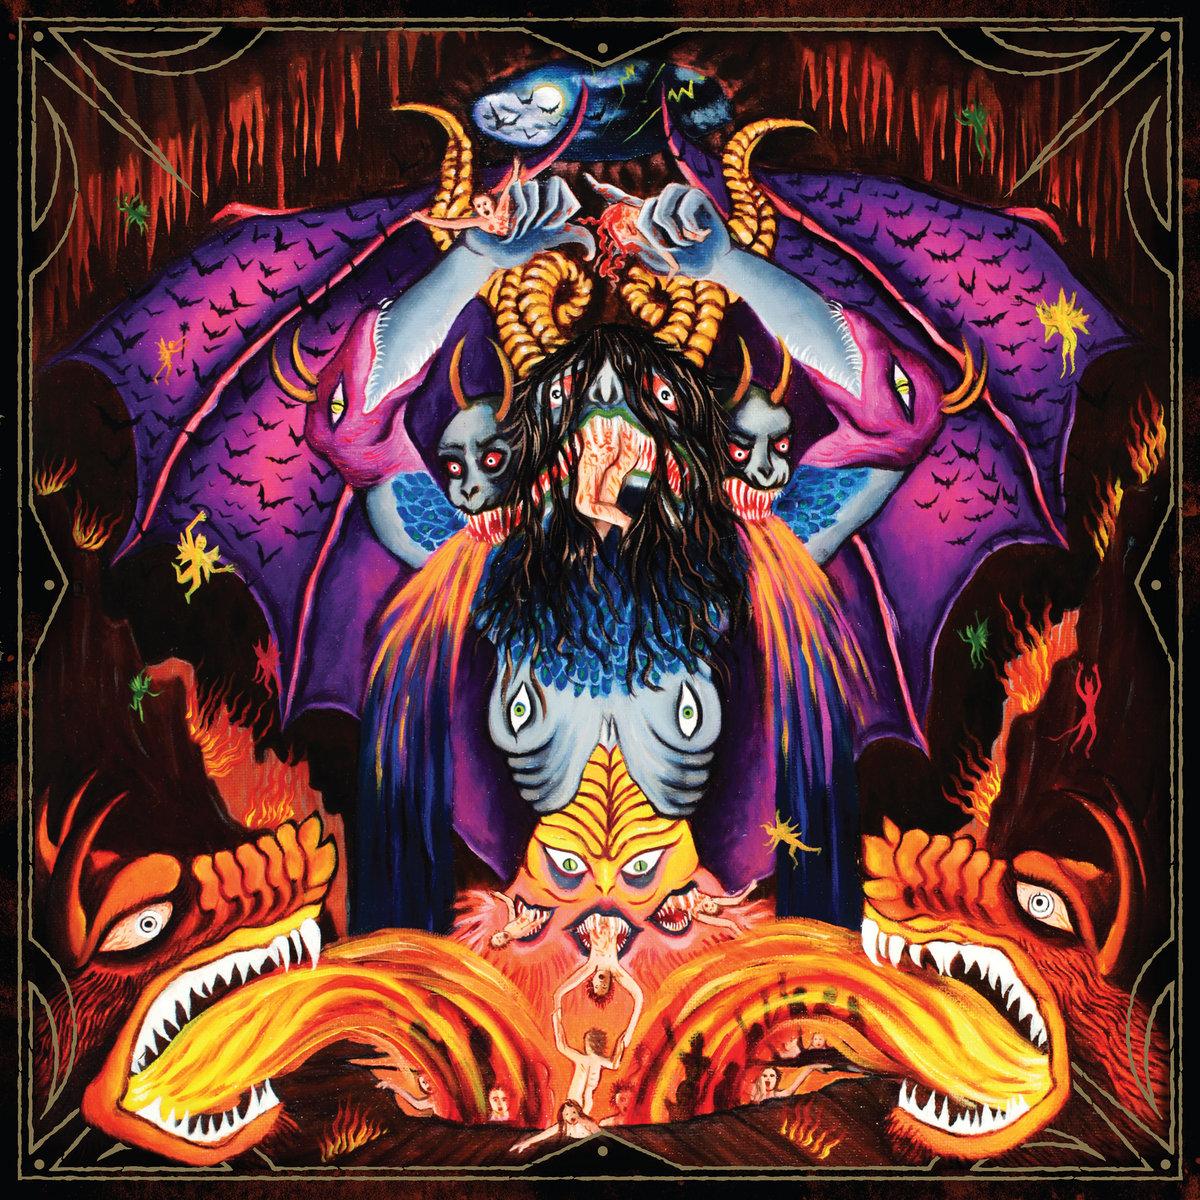 DEVIL MASTER